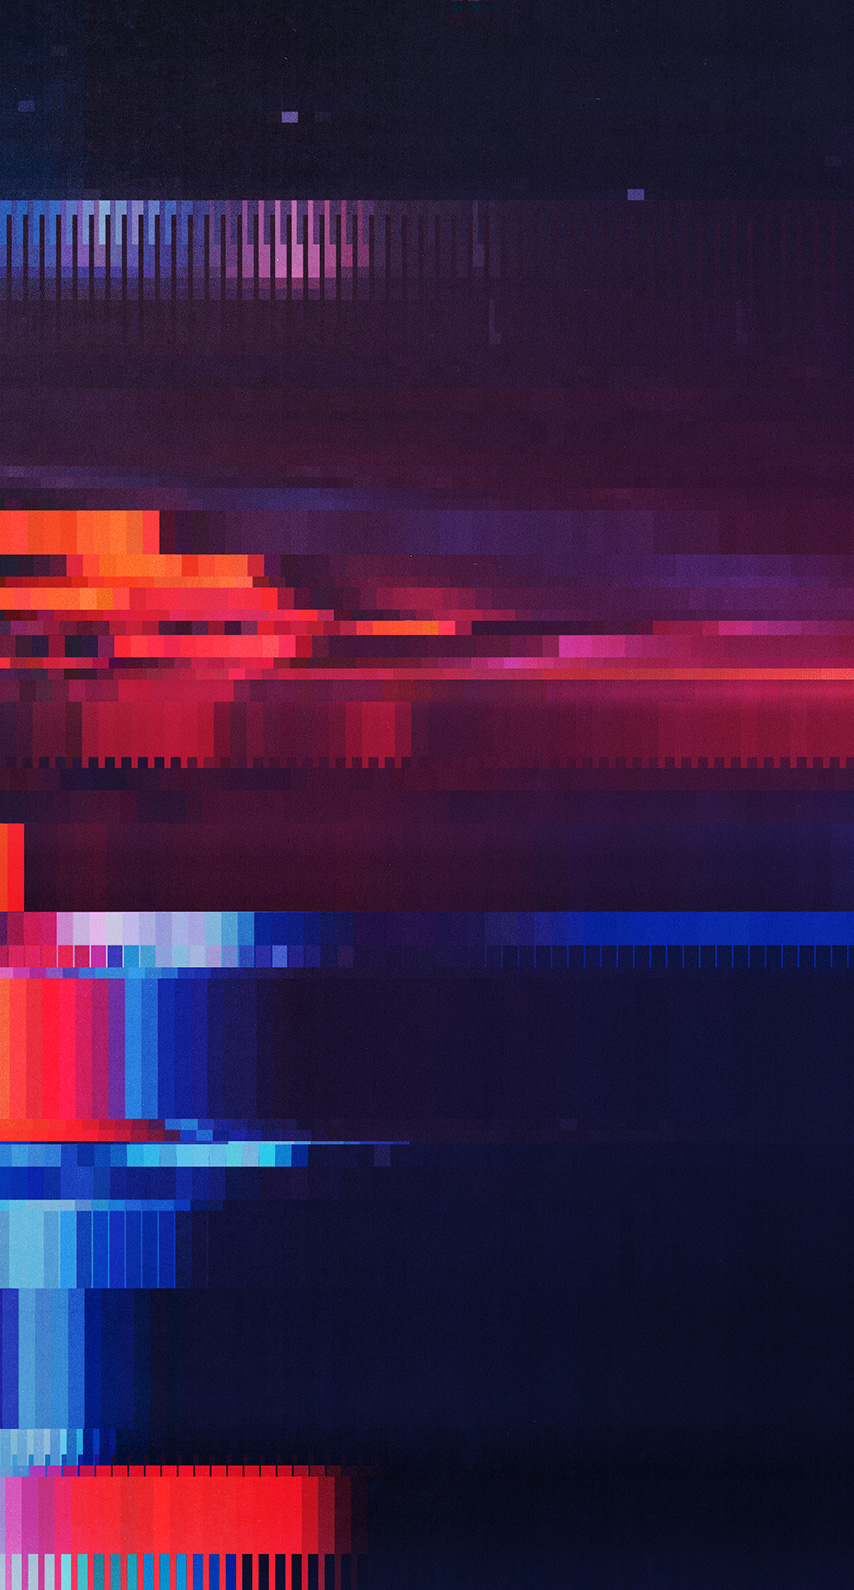 blur, line